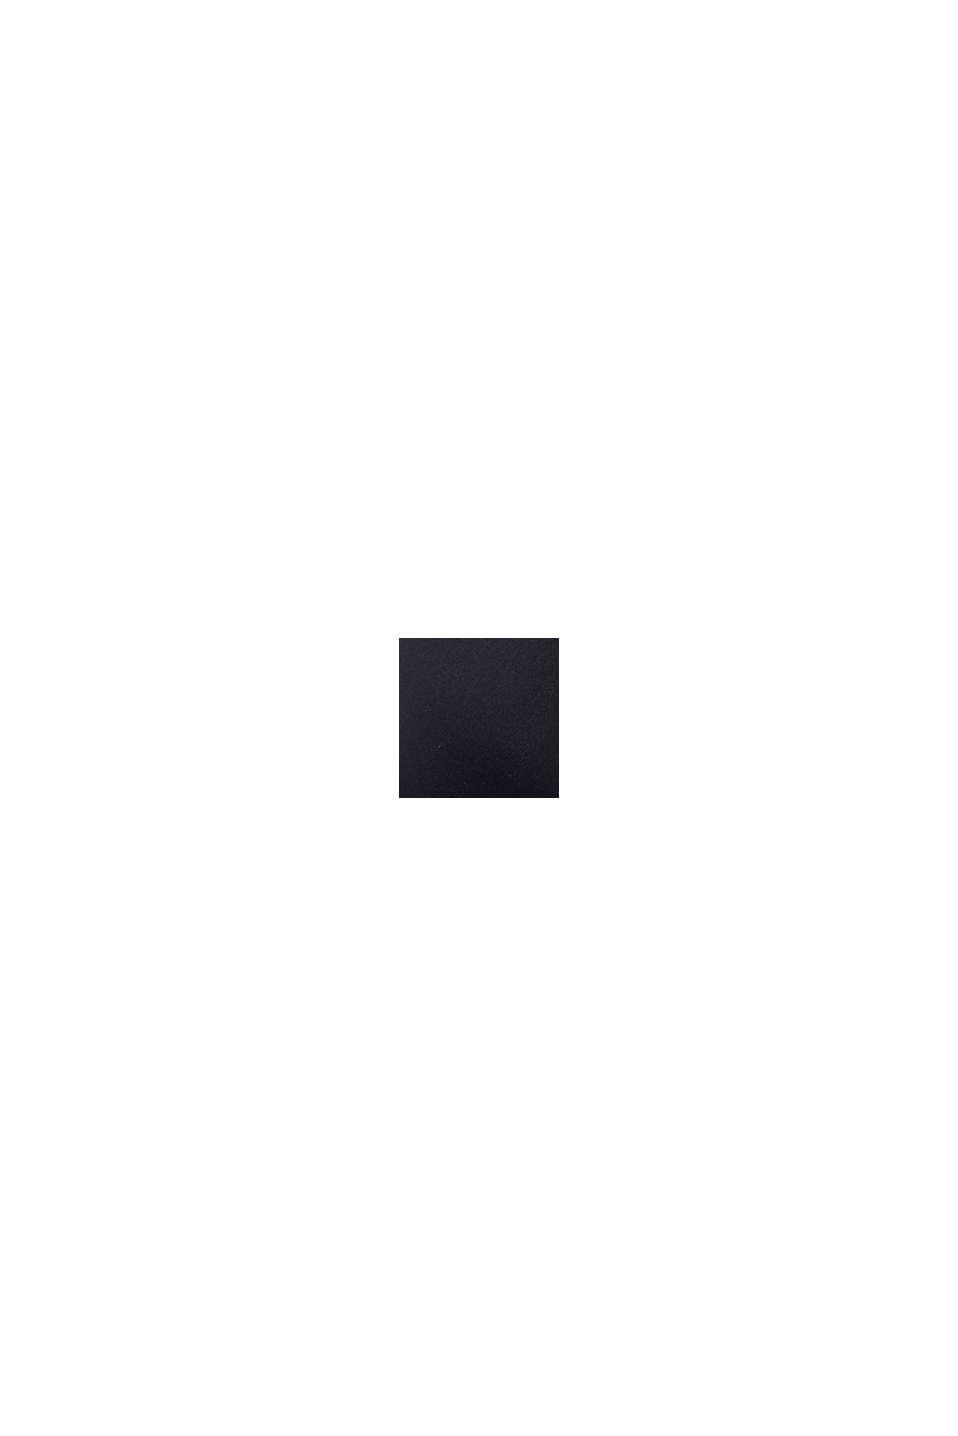 Push-up-Top mit Flecht-Details, BLACK, swatch